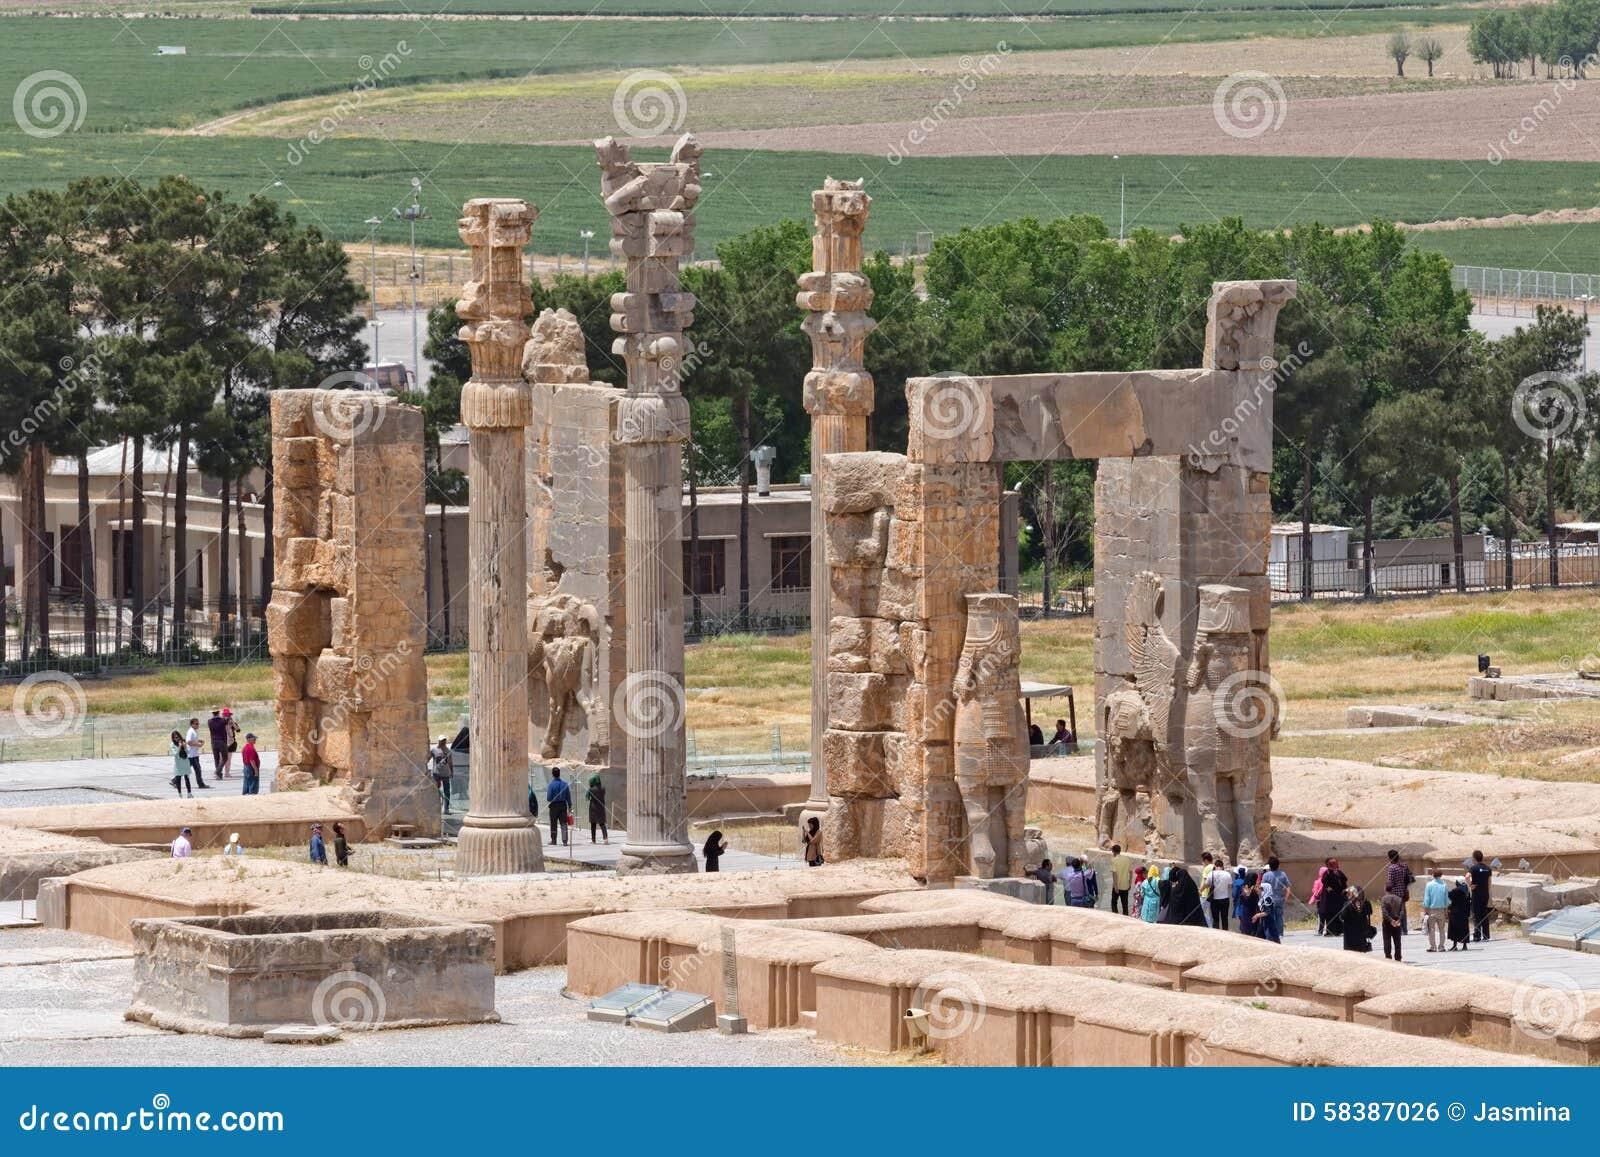 Persepolis Xerxes Gateway Editorial Photo Image Of Entrance 58387026